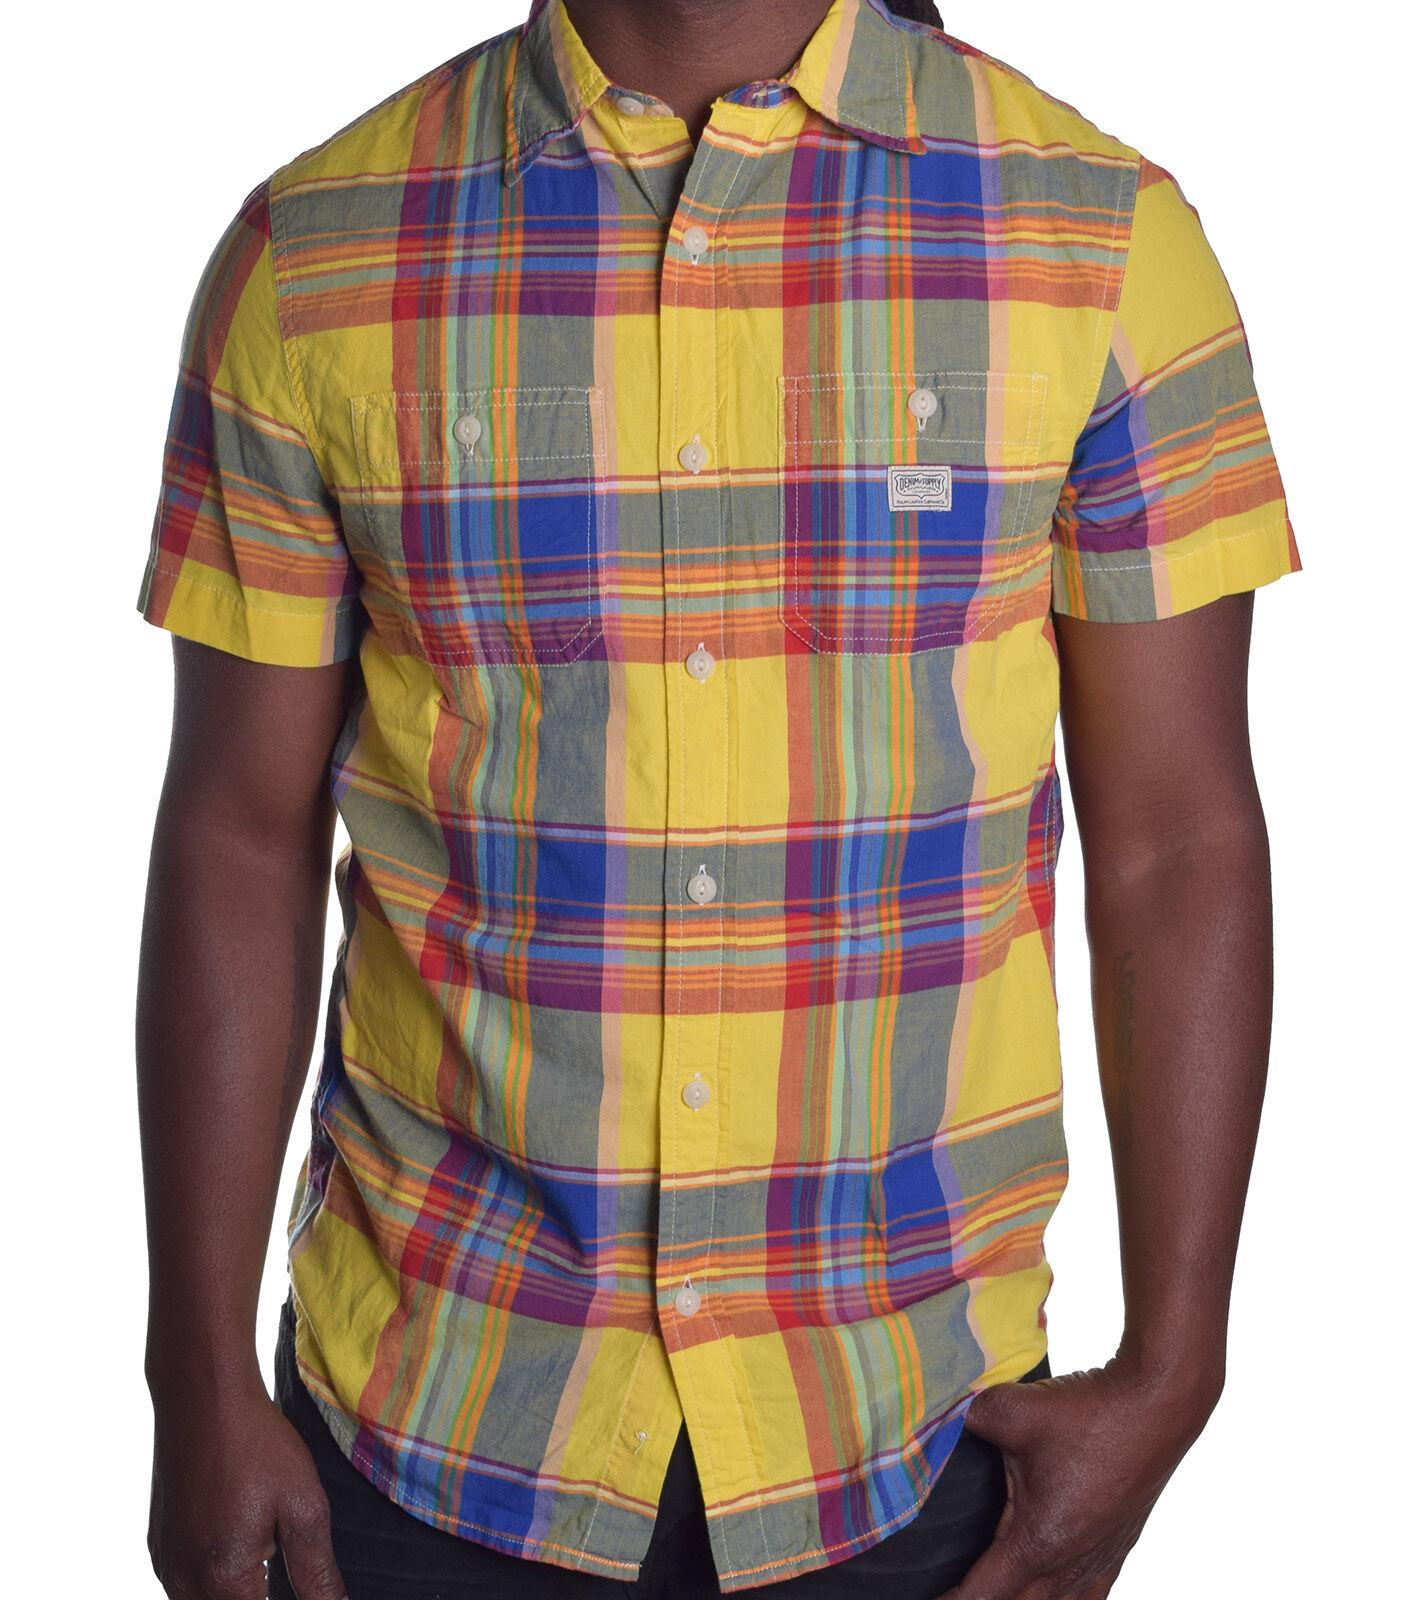 Ralph Lauren Denim & Supply  Multi Yellow Plaid Button Up Shirt Choose Size